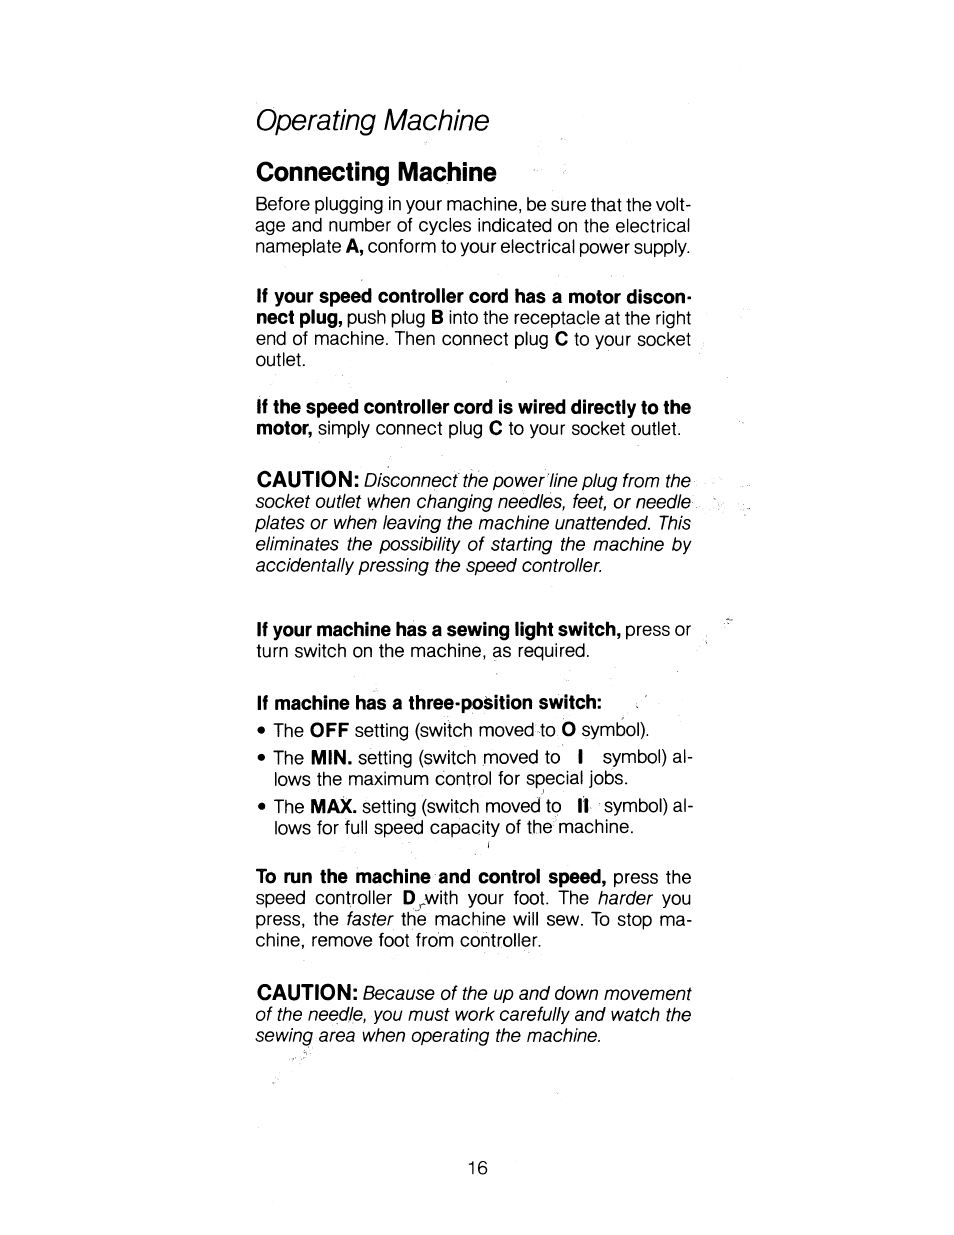 Connecting machine, Operating machine | SINGER 1263 User Manual ...